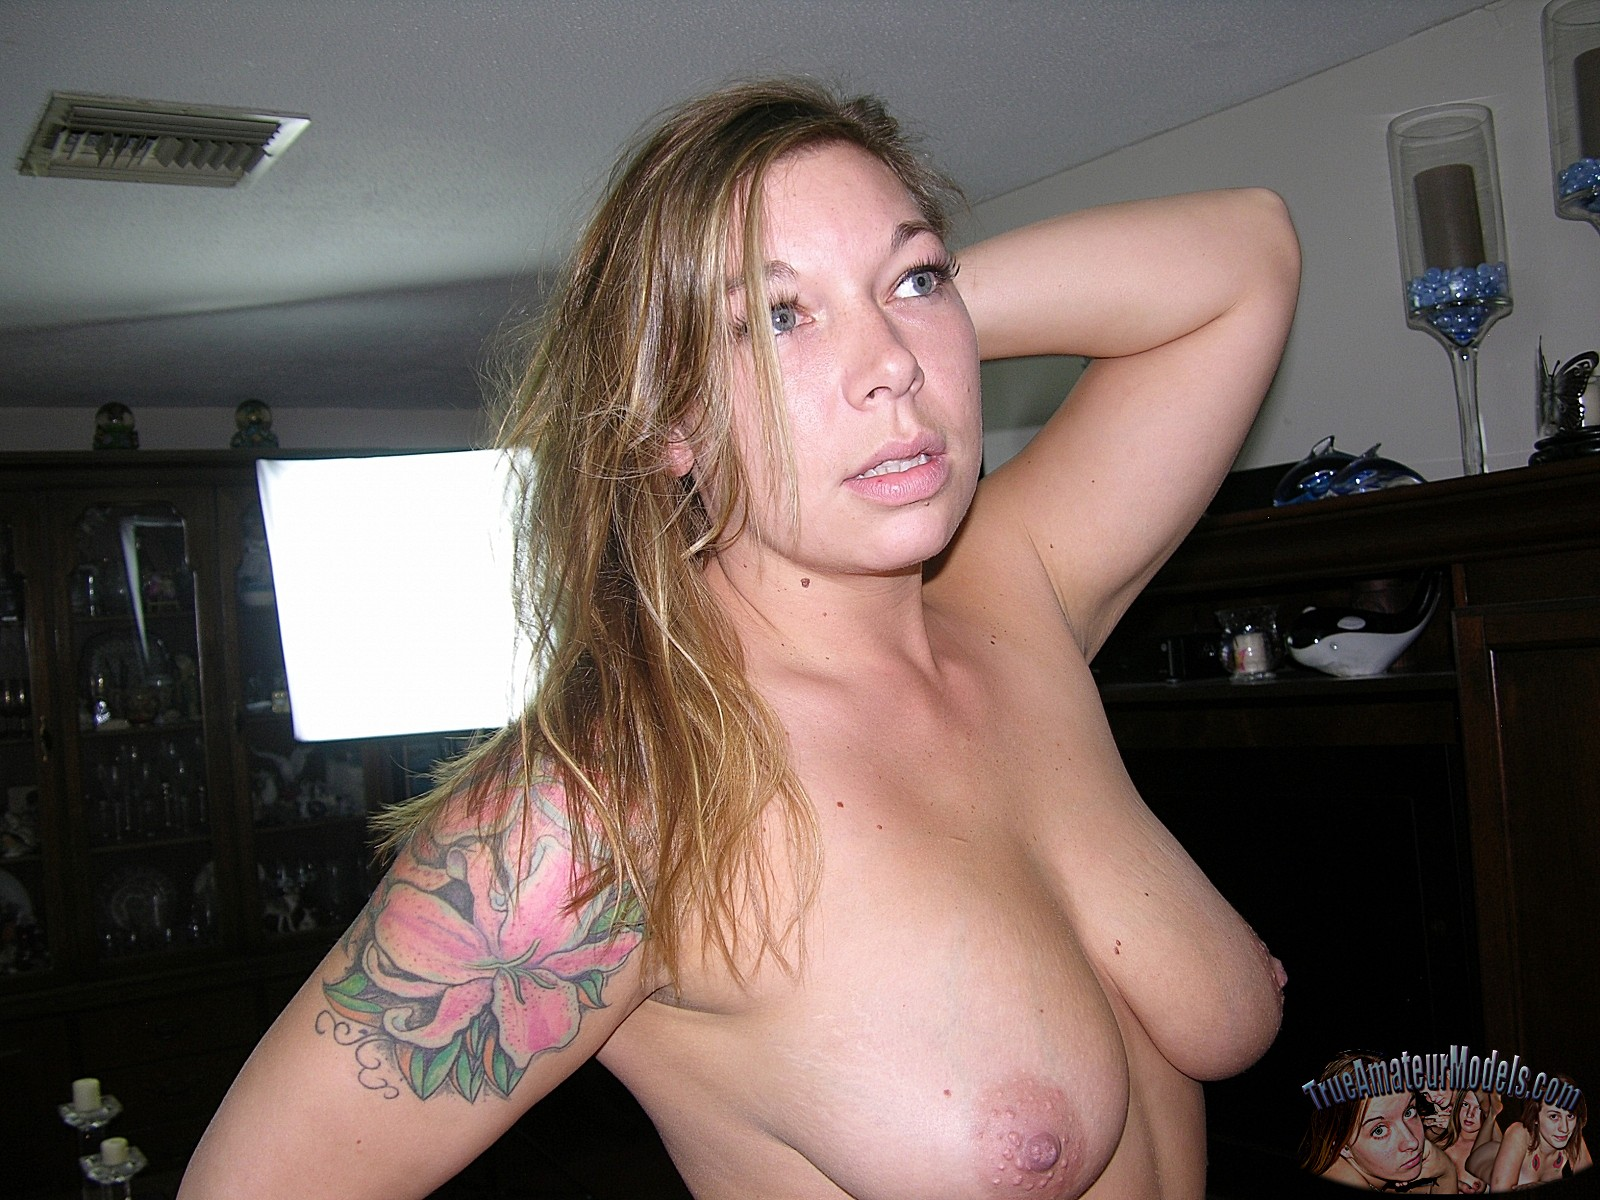 Ebony onion booty amateur porn video